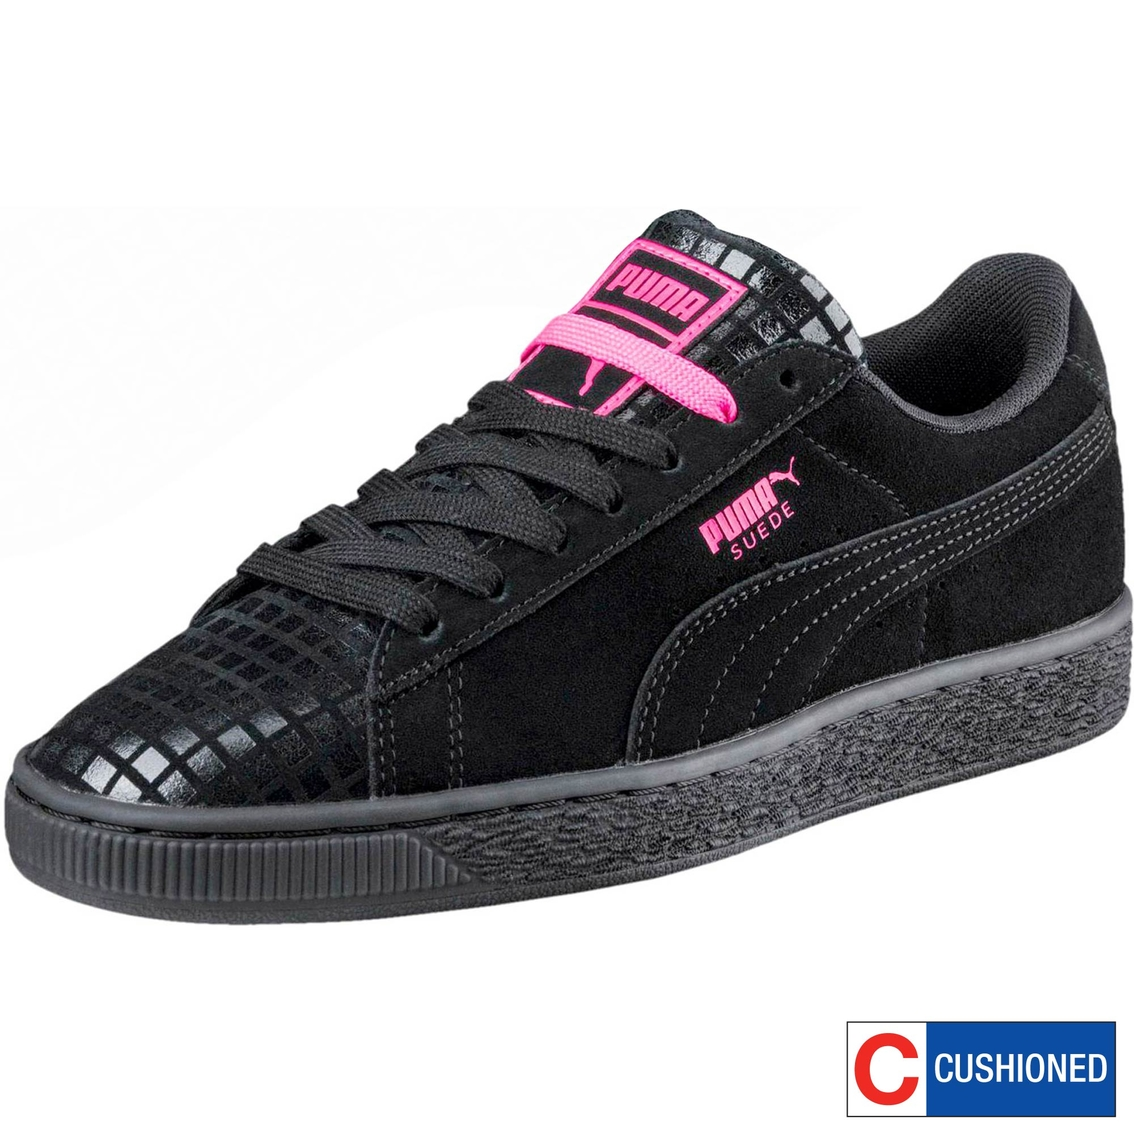 Puma Women s Suede Classic Street 2+ Sneakers  47260b762